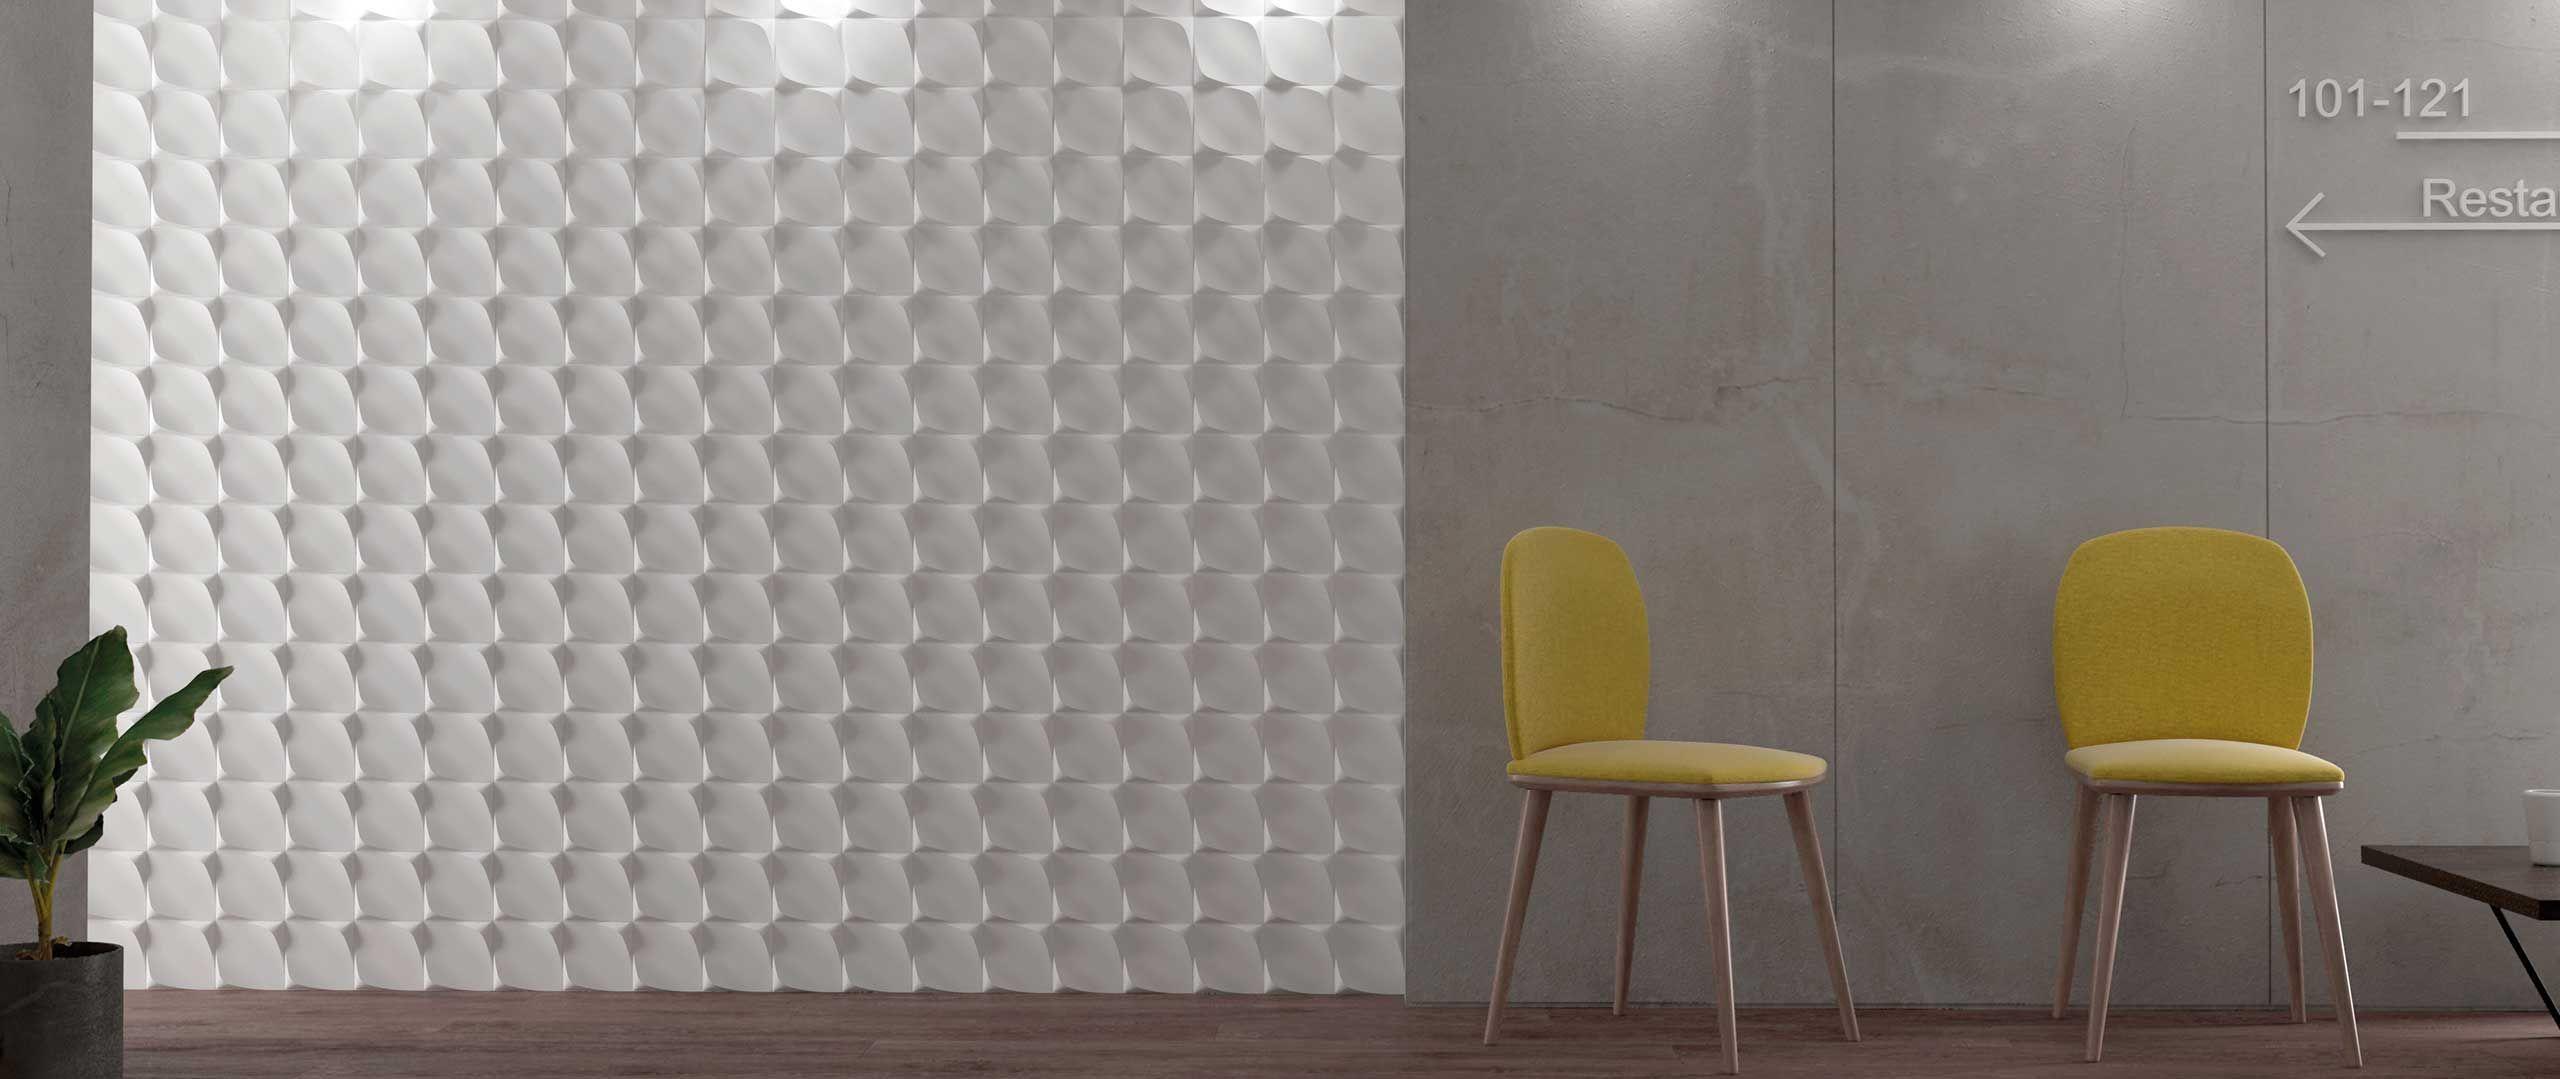 wave contract by wow design eu 3d ceramic trends tiles studio architecture ambient 3